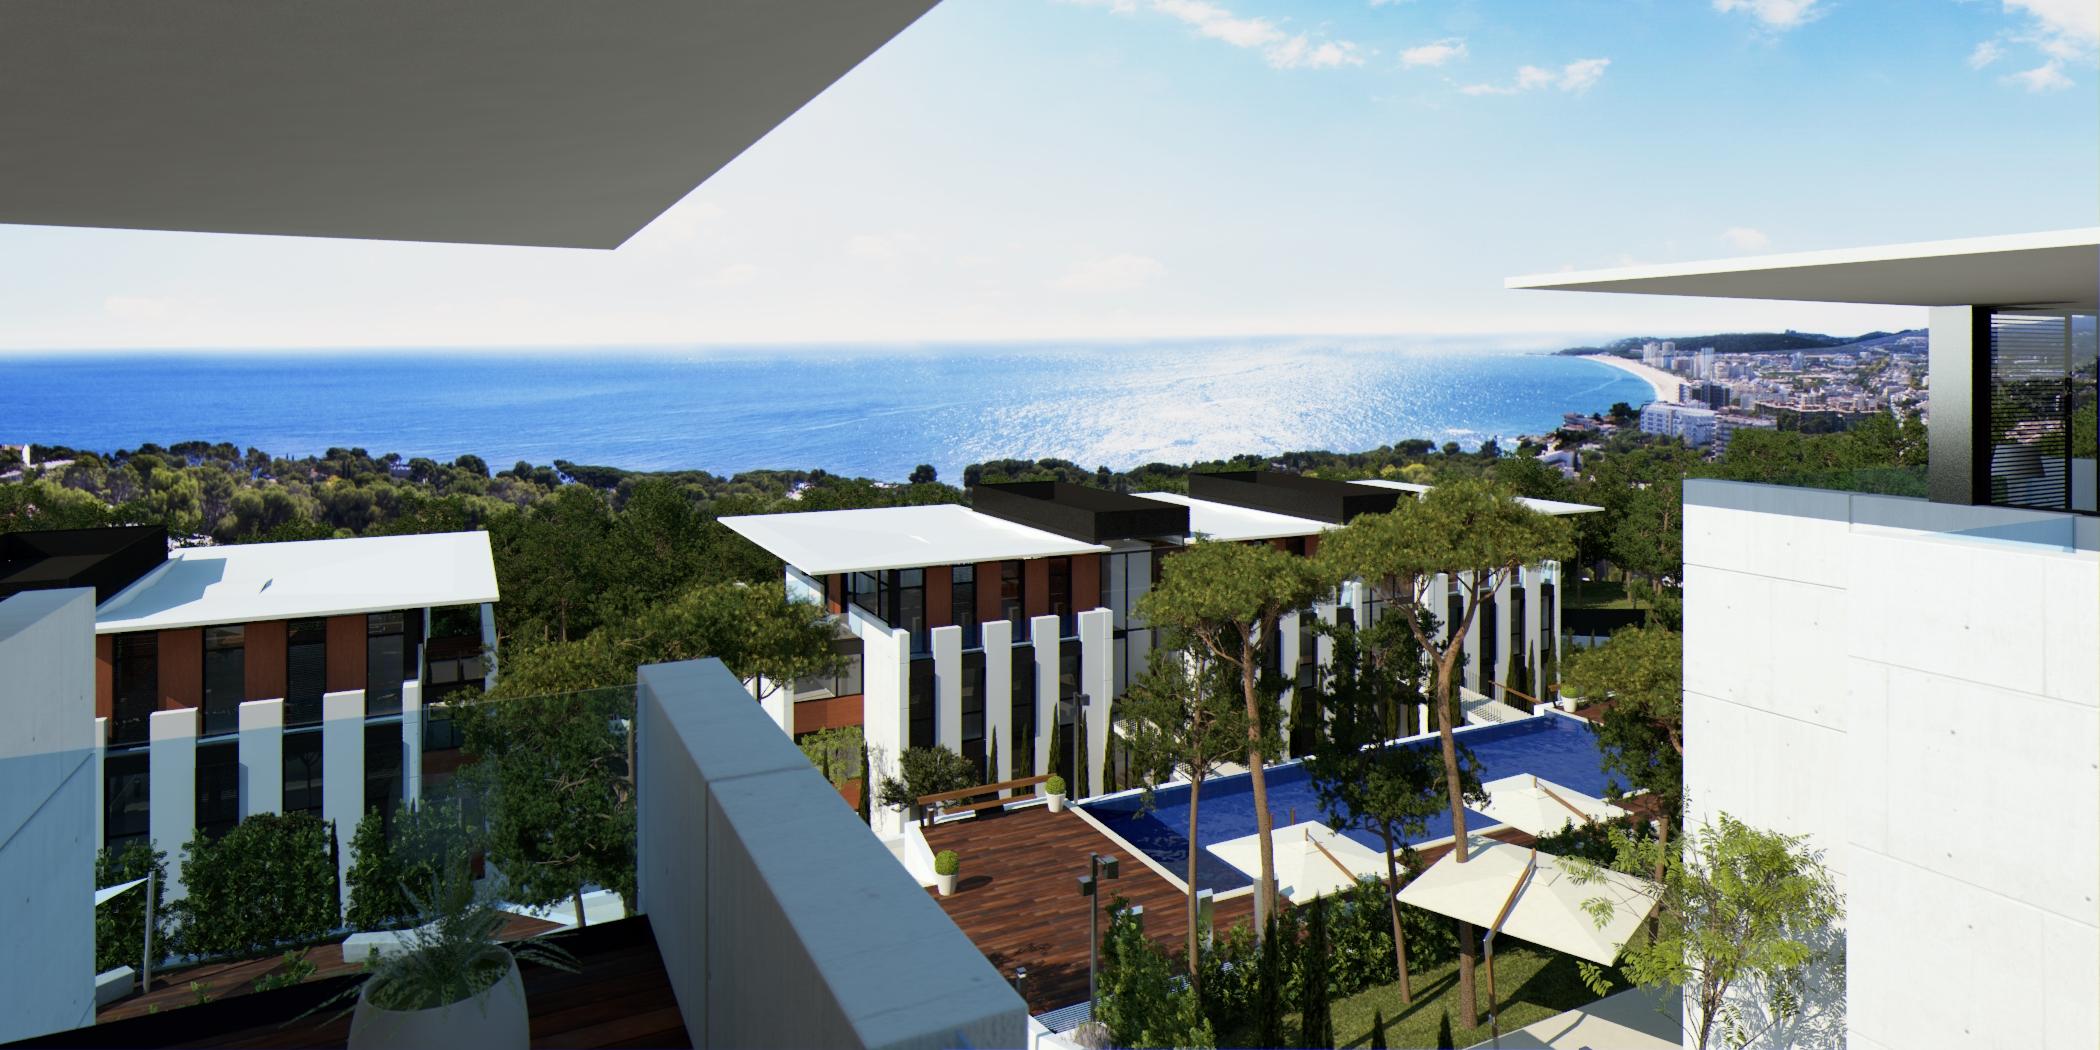 Appartement pour l Vente à First floor apartment in a new exclusive development Playa De Aro, Costa Brava, 17250 Espagne